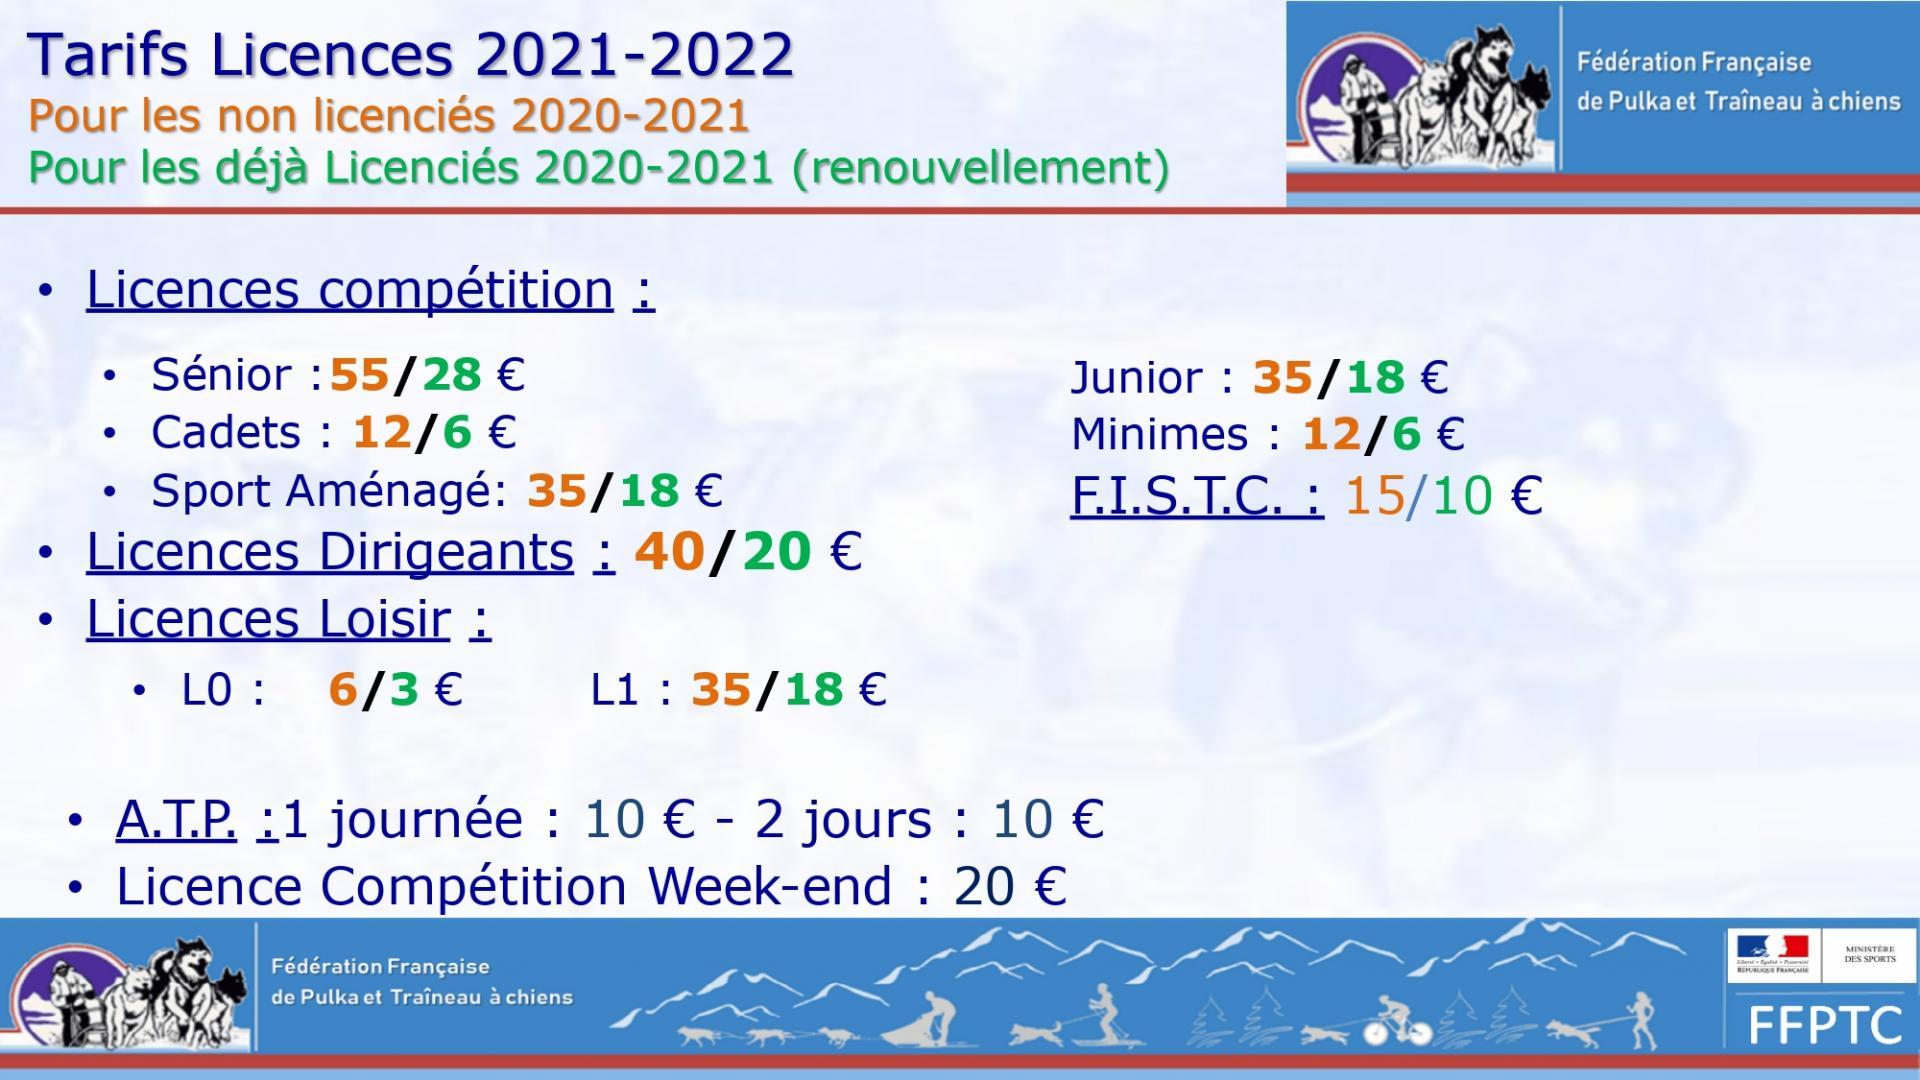 Formulaires de demande de licence 2021-2022